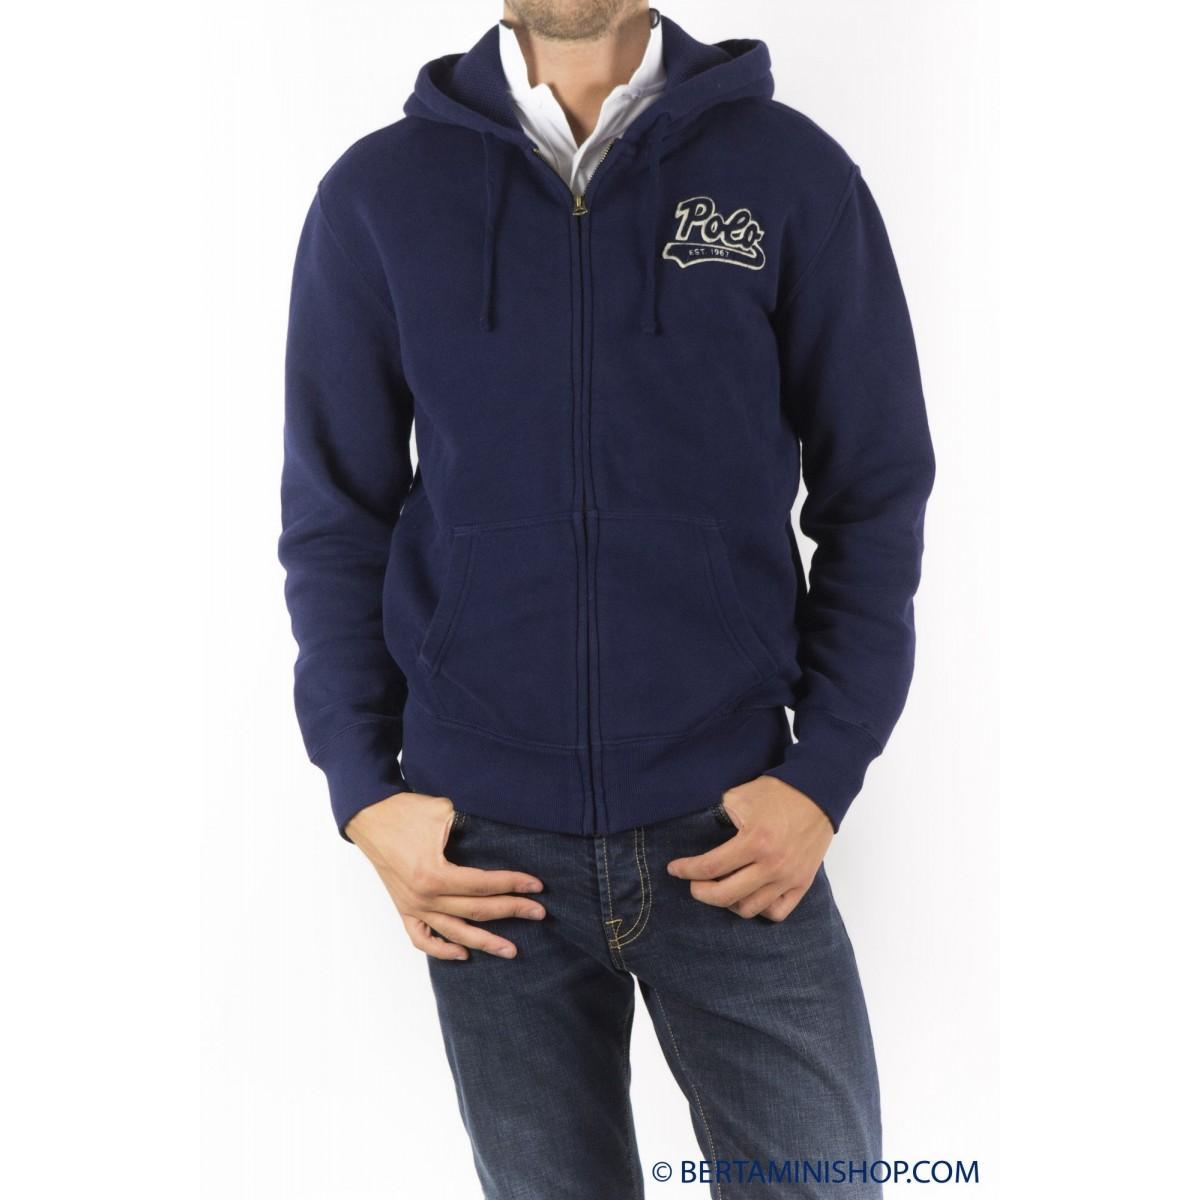 Hoodie Ralph Lauren Man - A14Kyingbbiba A4560 - Blu navy